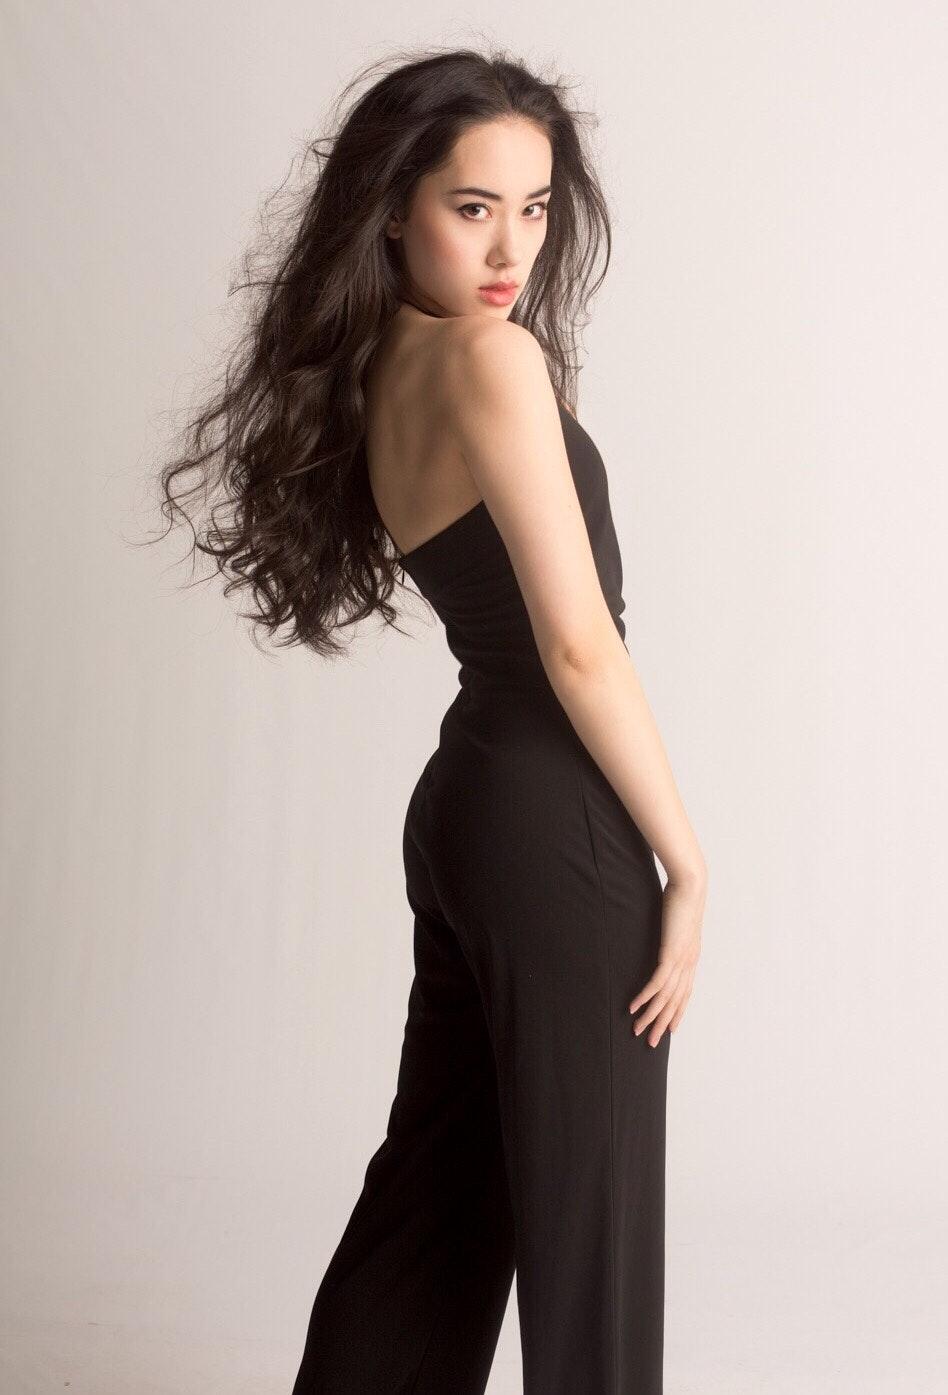 Elena House's Model portfolio